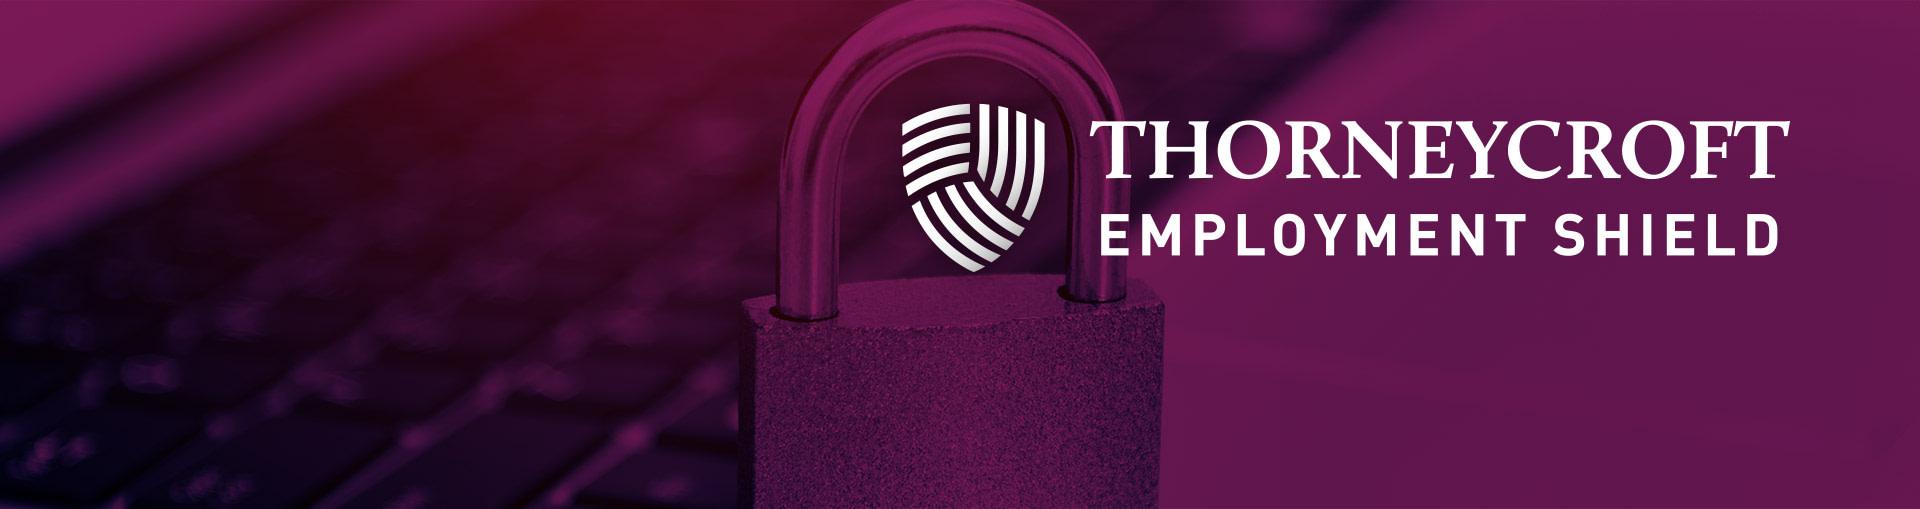 Employment Shield